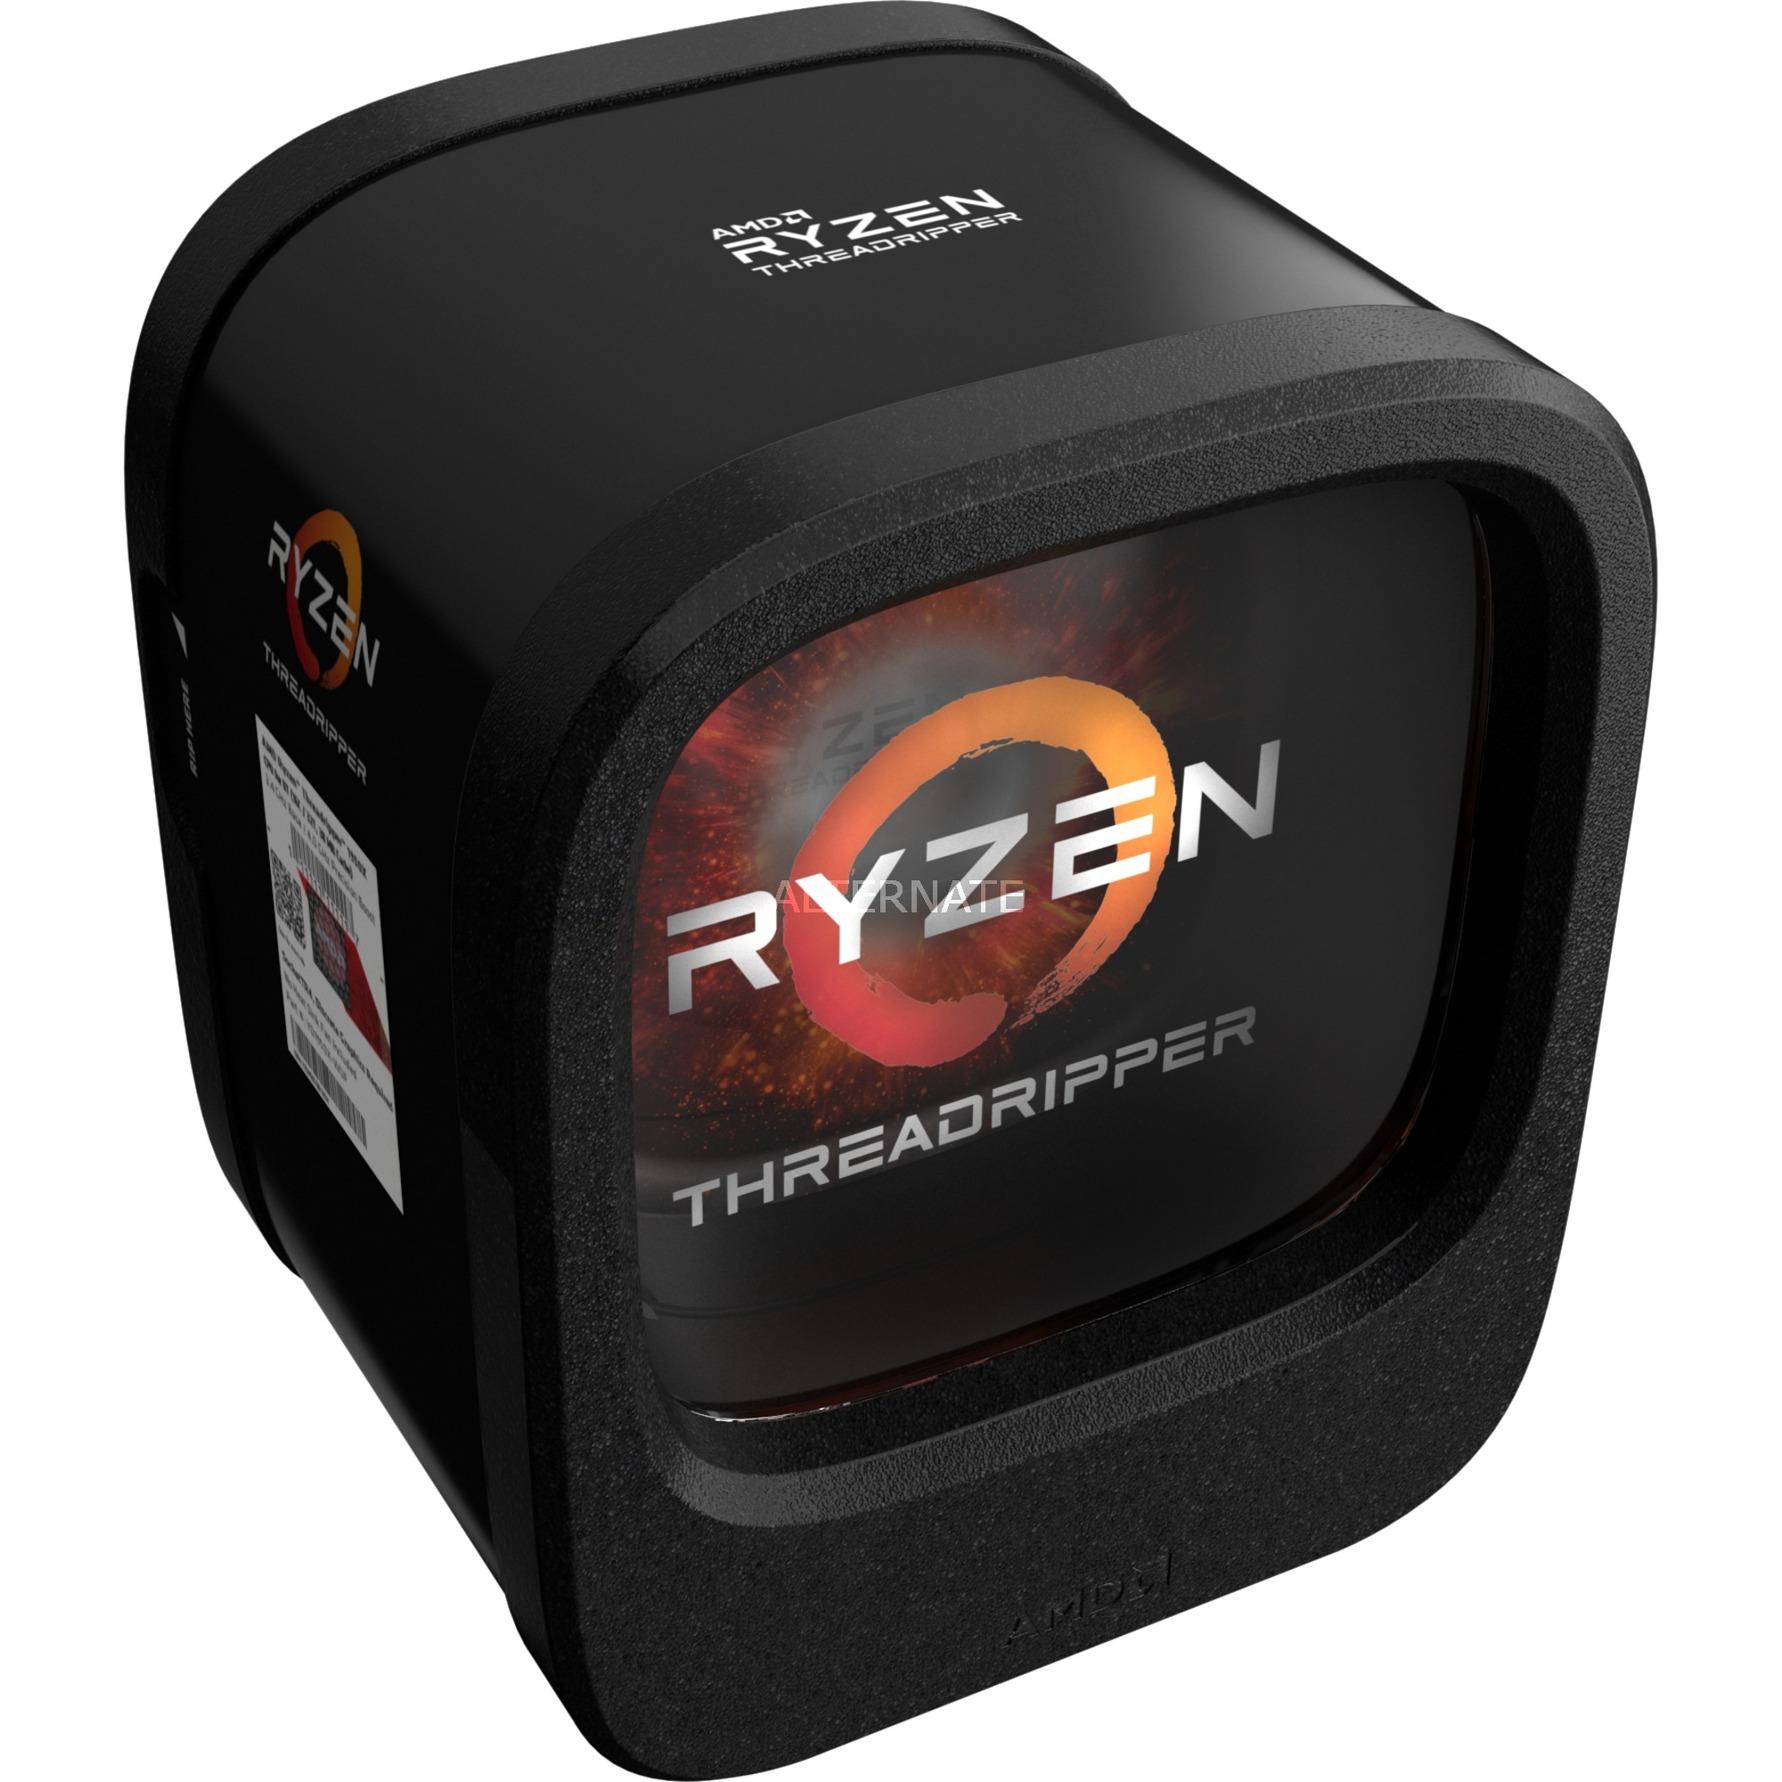 Ryzen Threadripper 1900X 3.8GHz 16MB L3 Caja procesador